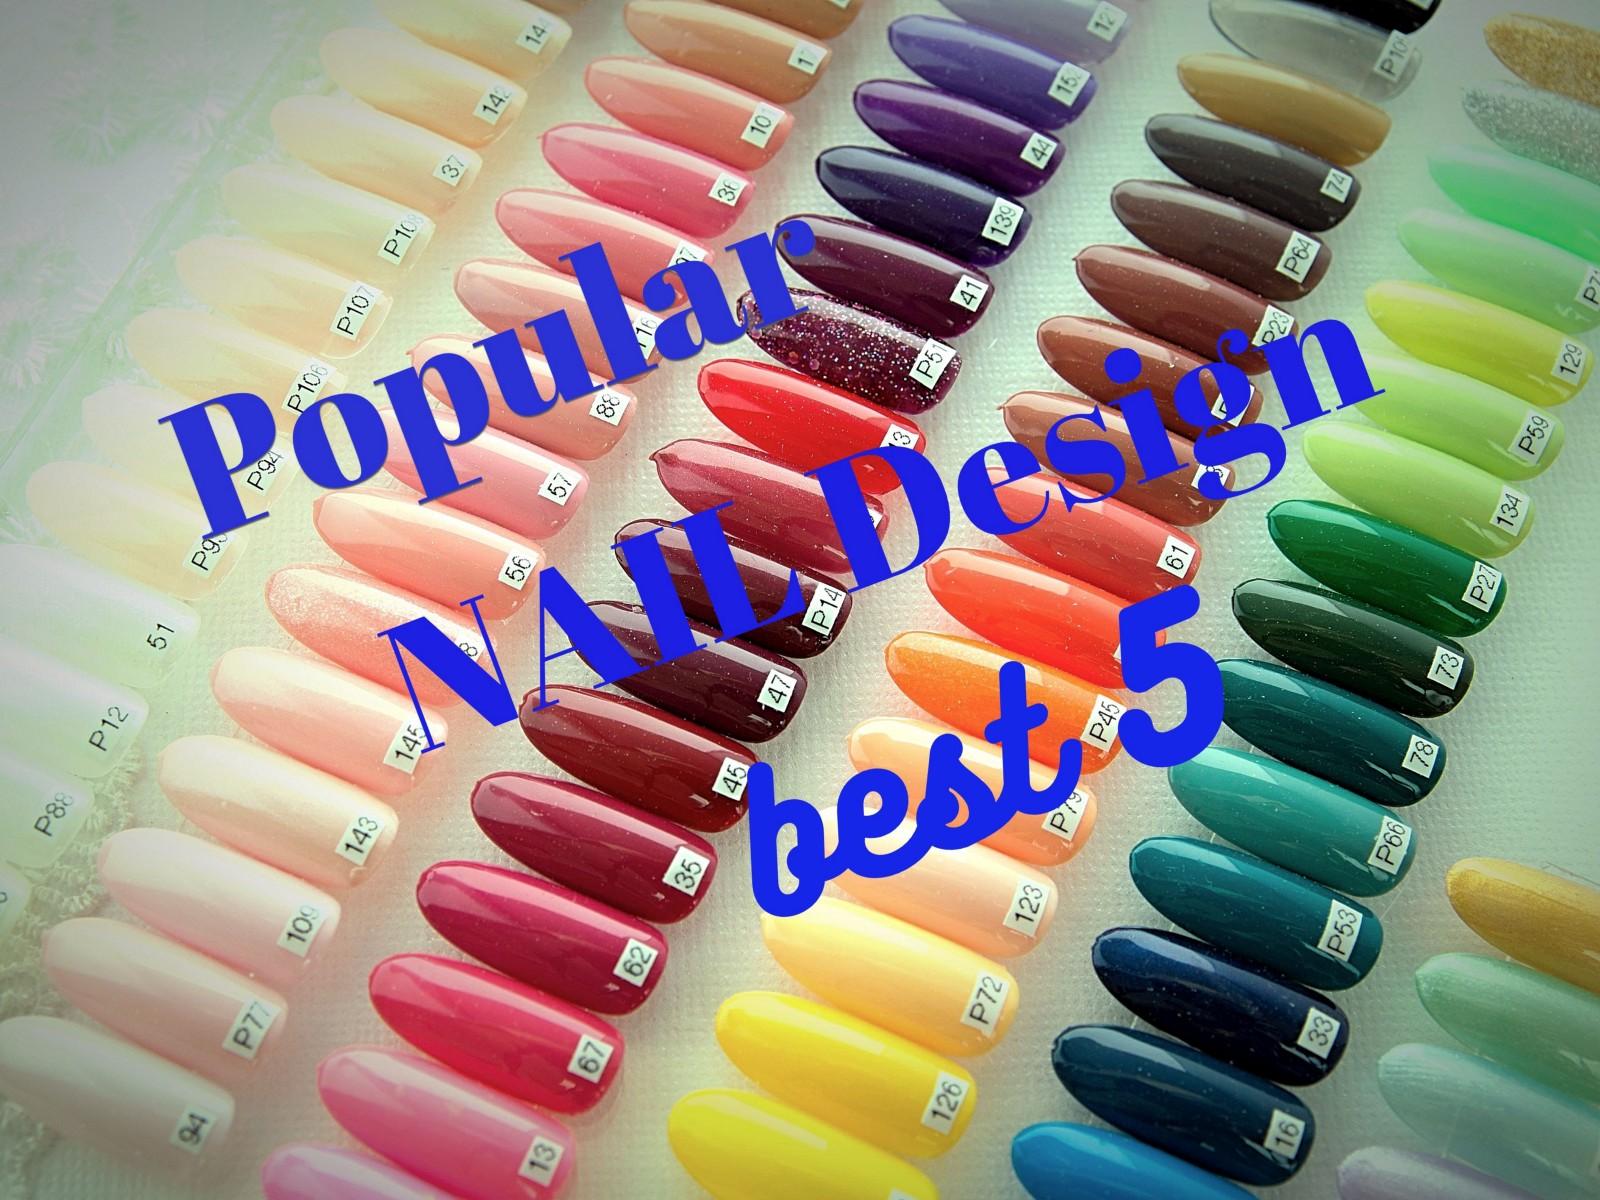 Japanese Nail Art: Top 5 Popular Designs 2019